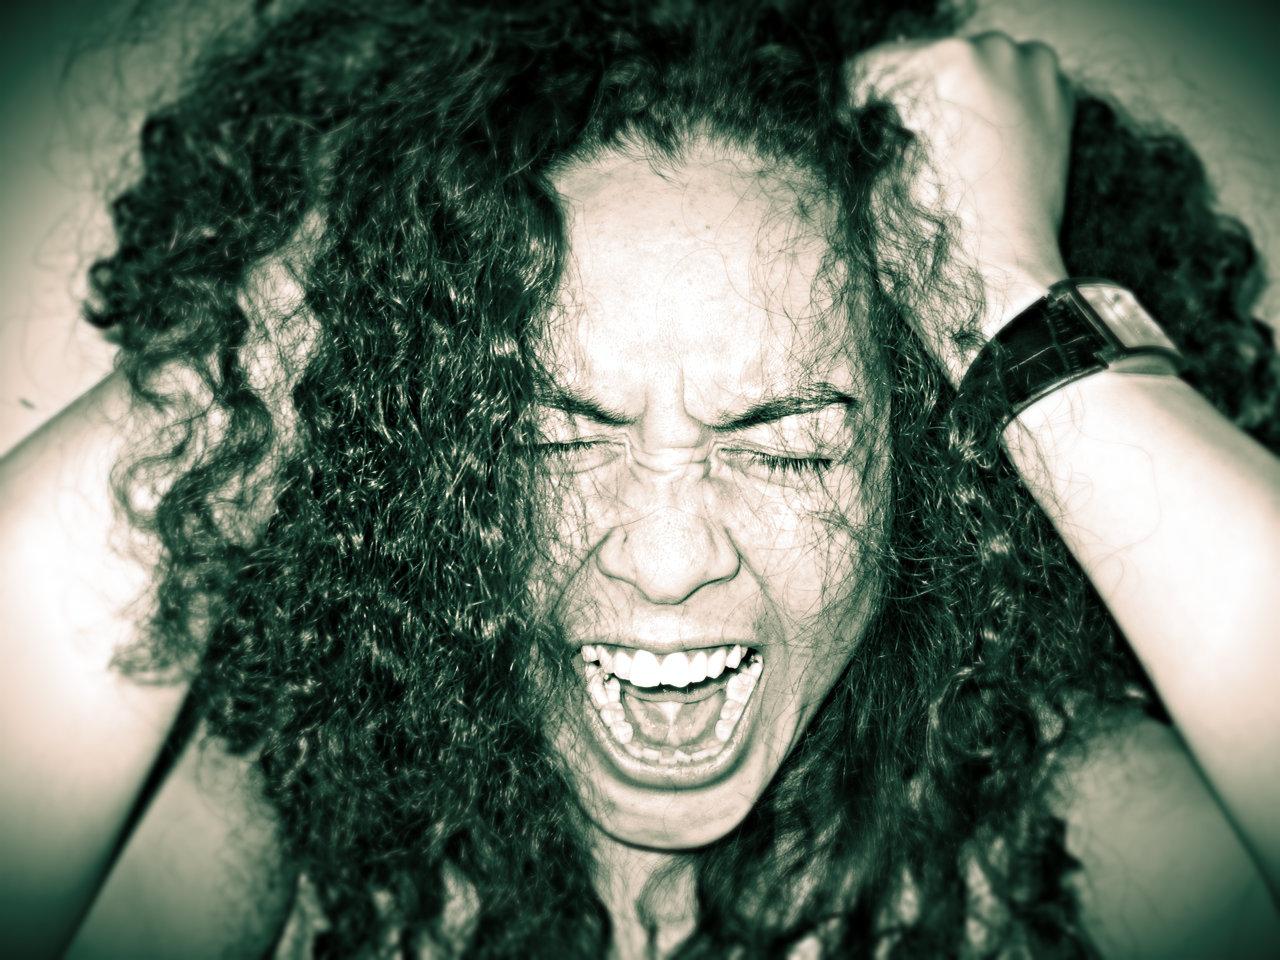 donna-arrabbiata